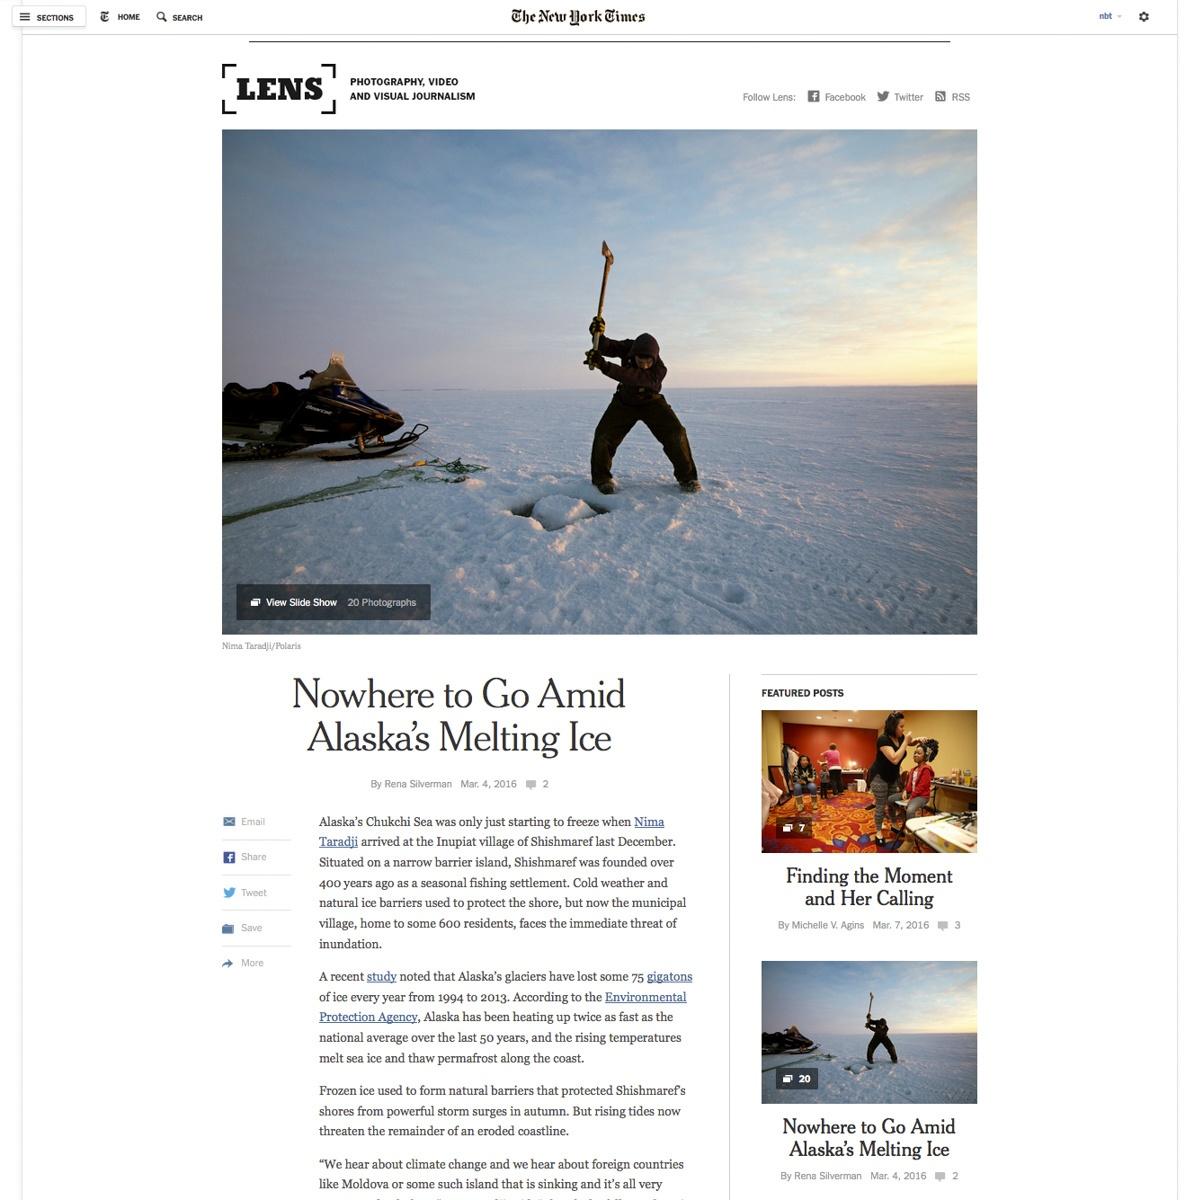 On New York Times' Lens Blog